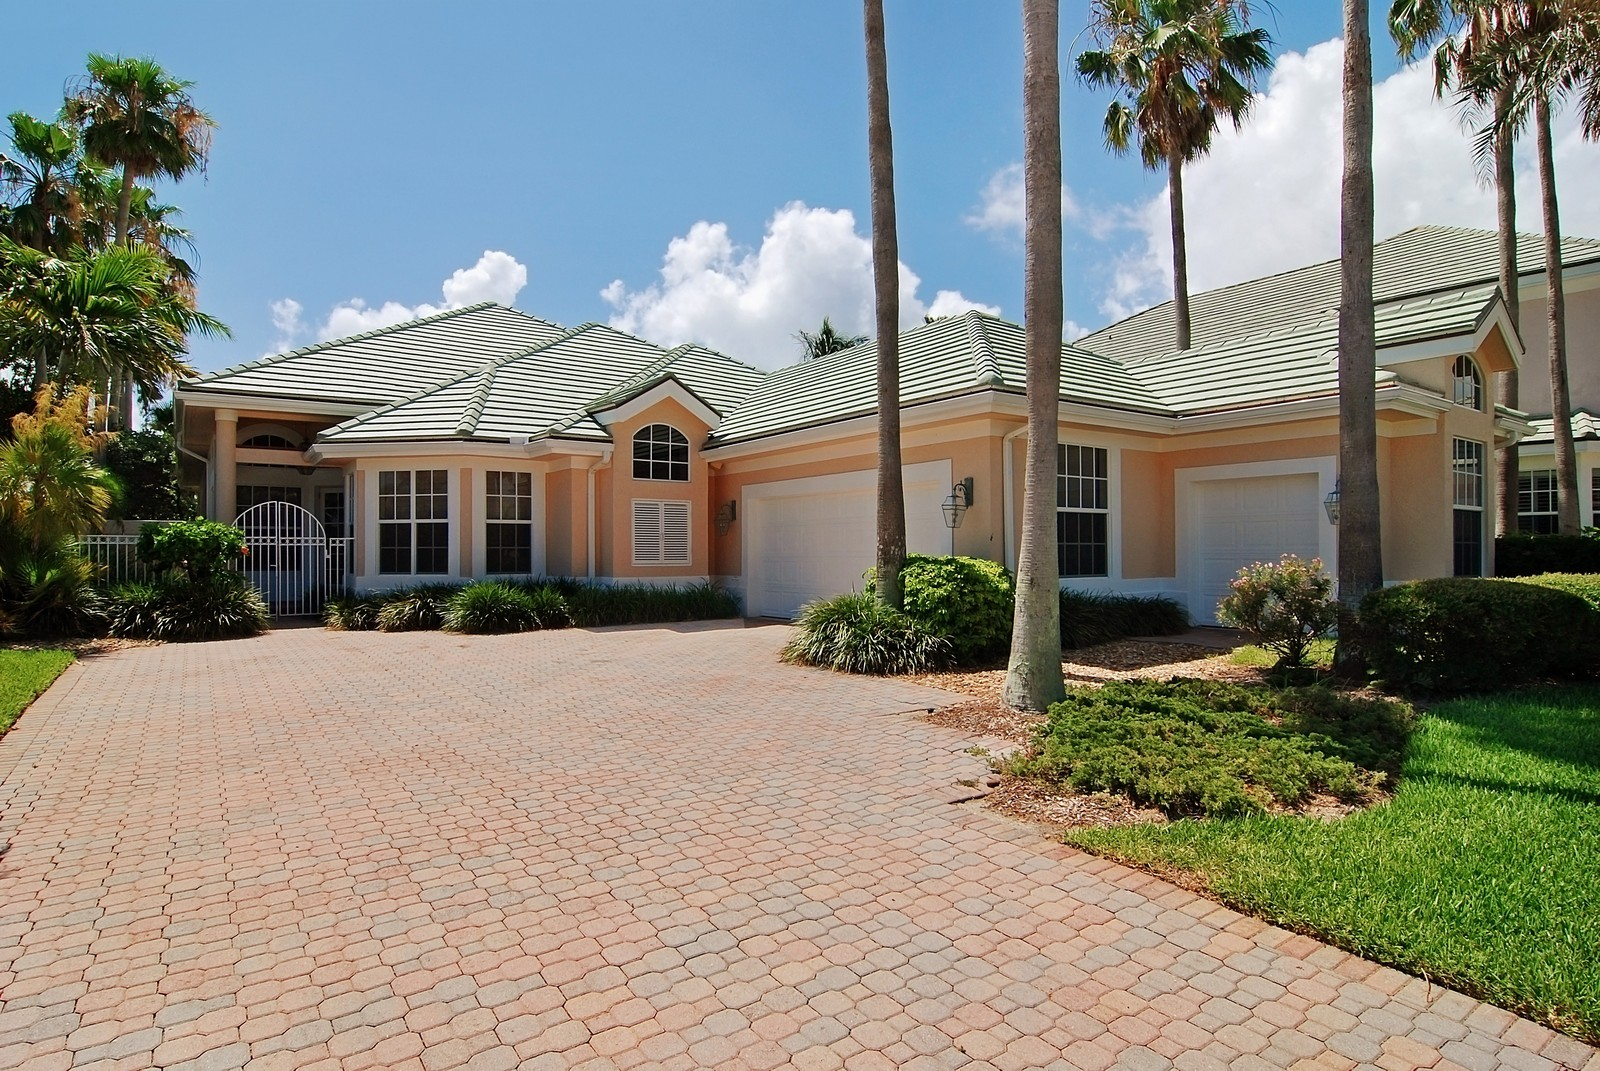 Real Estate Photography - 7000 SE Lakeview, Stuart, FL, 34996 - Front View